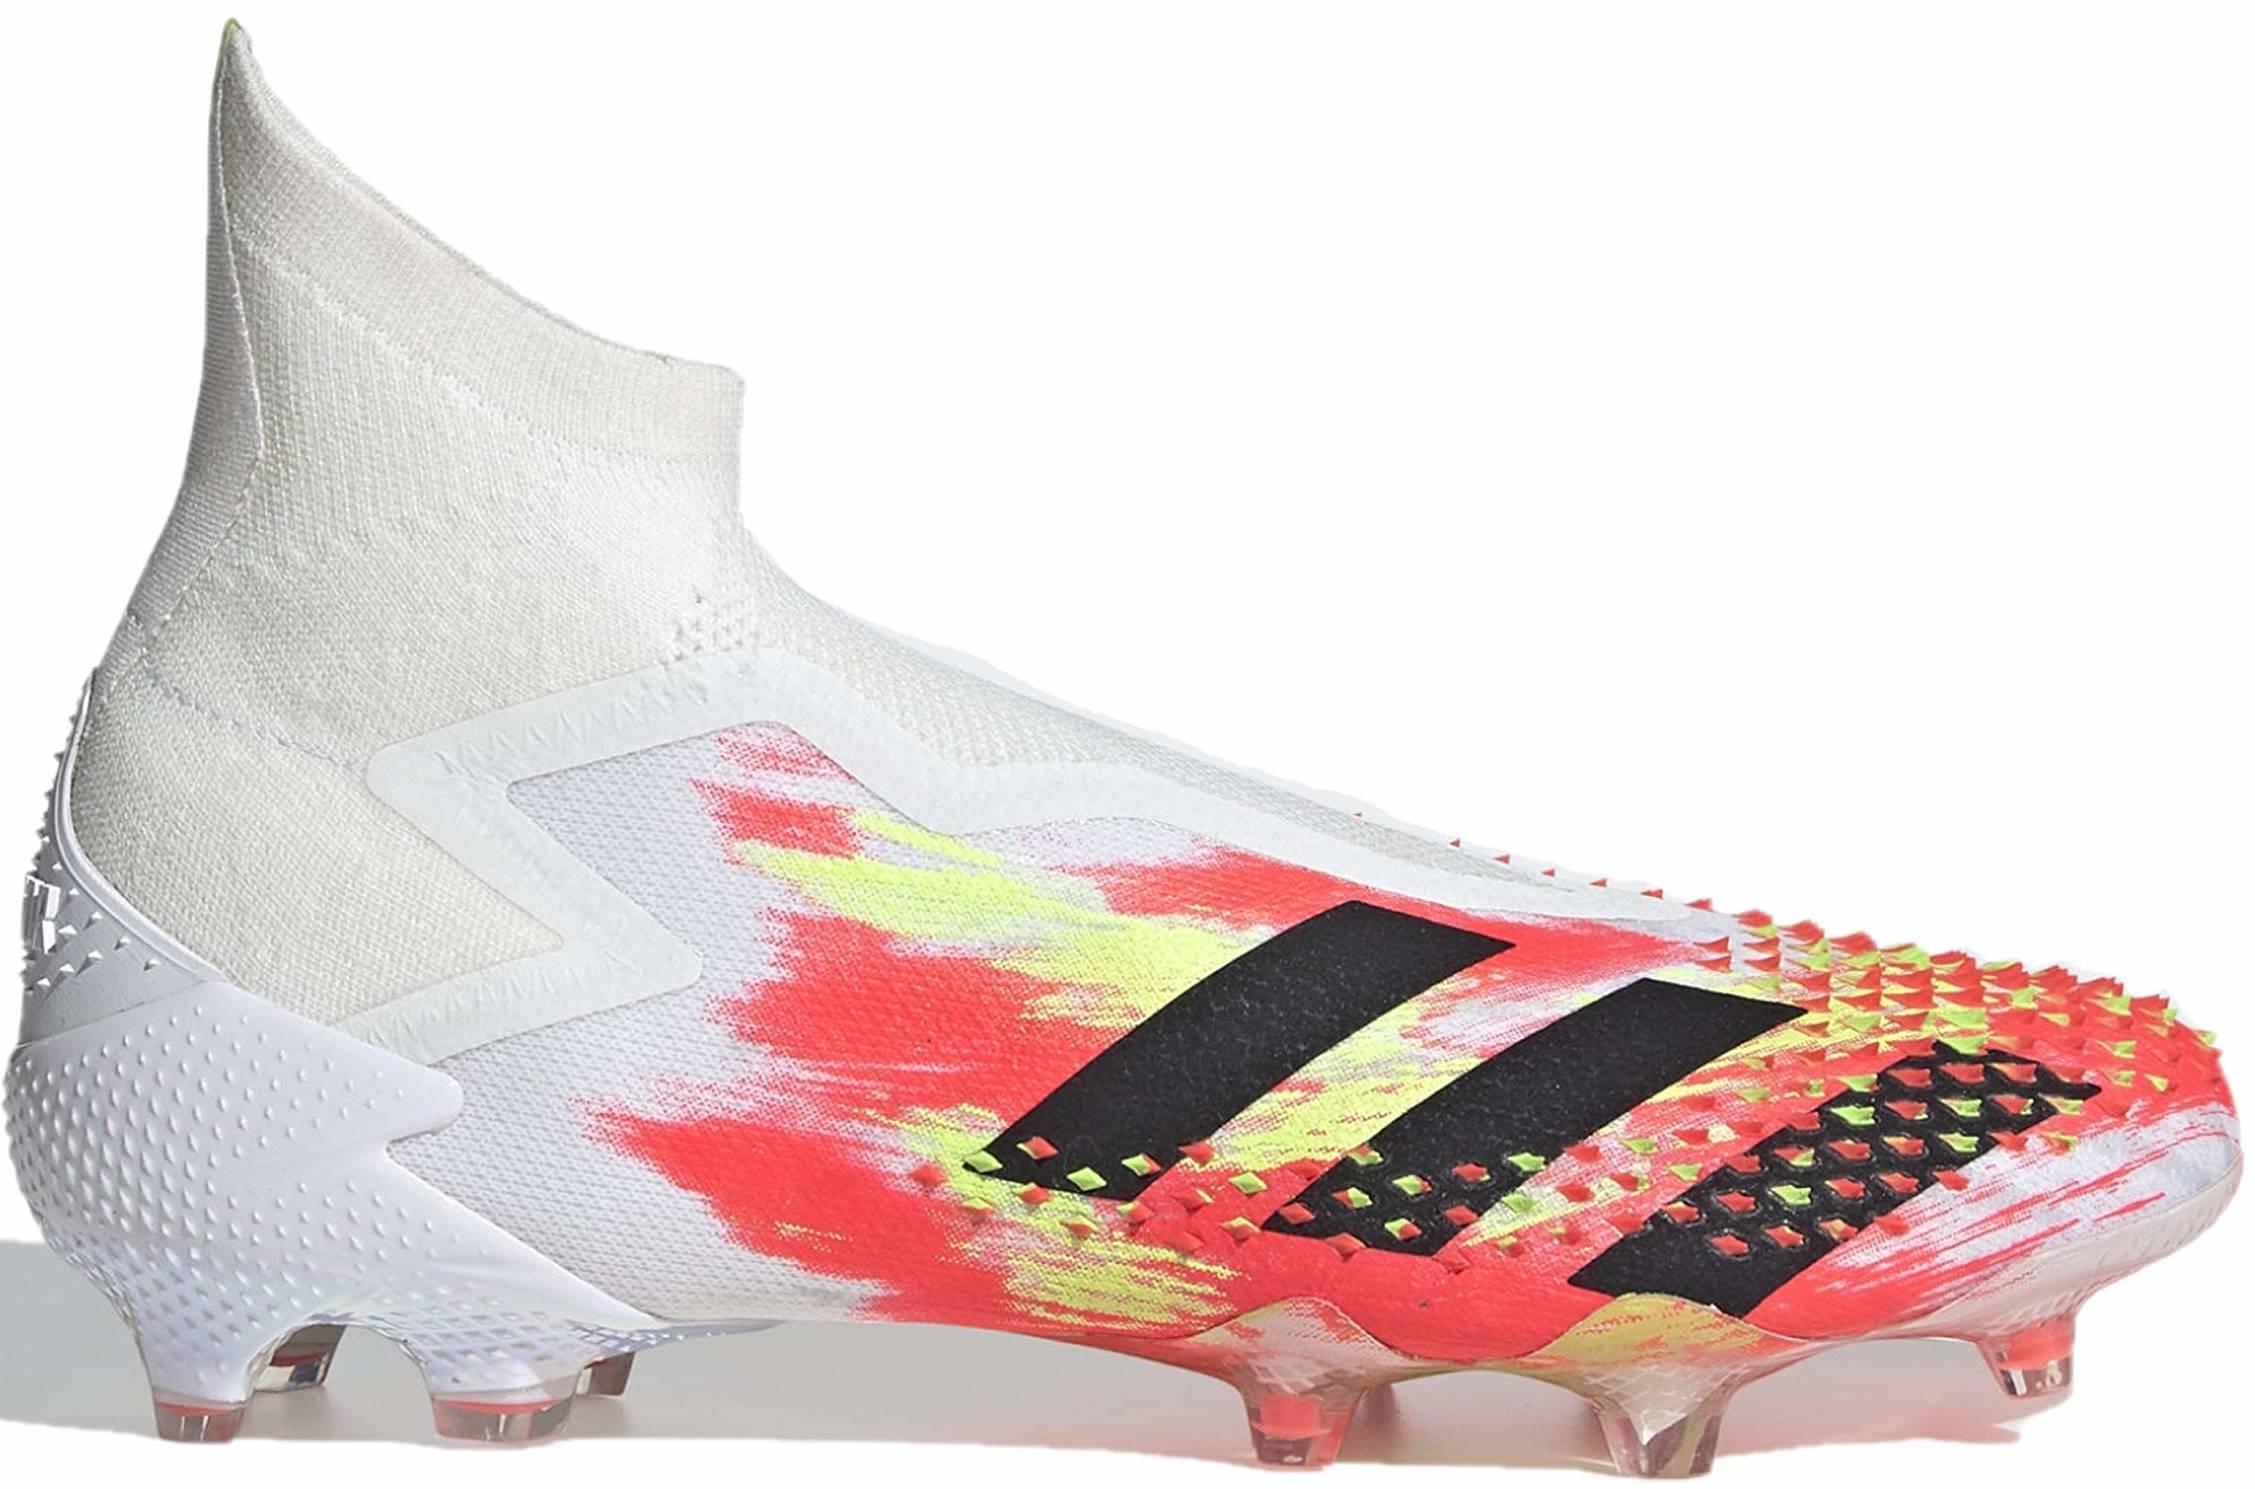 Adidas Predator soccer cleats | Save 63% | 41 models | RunRepeat